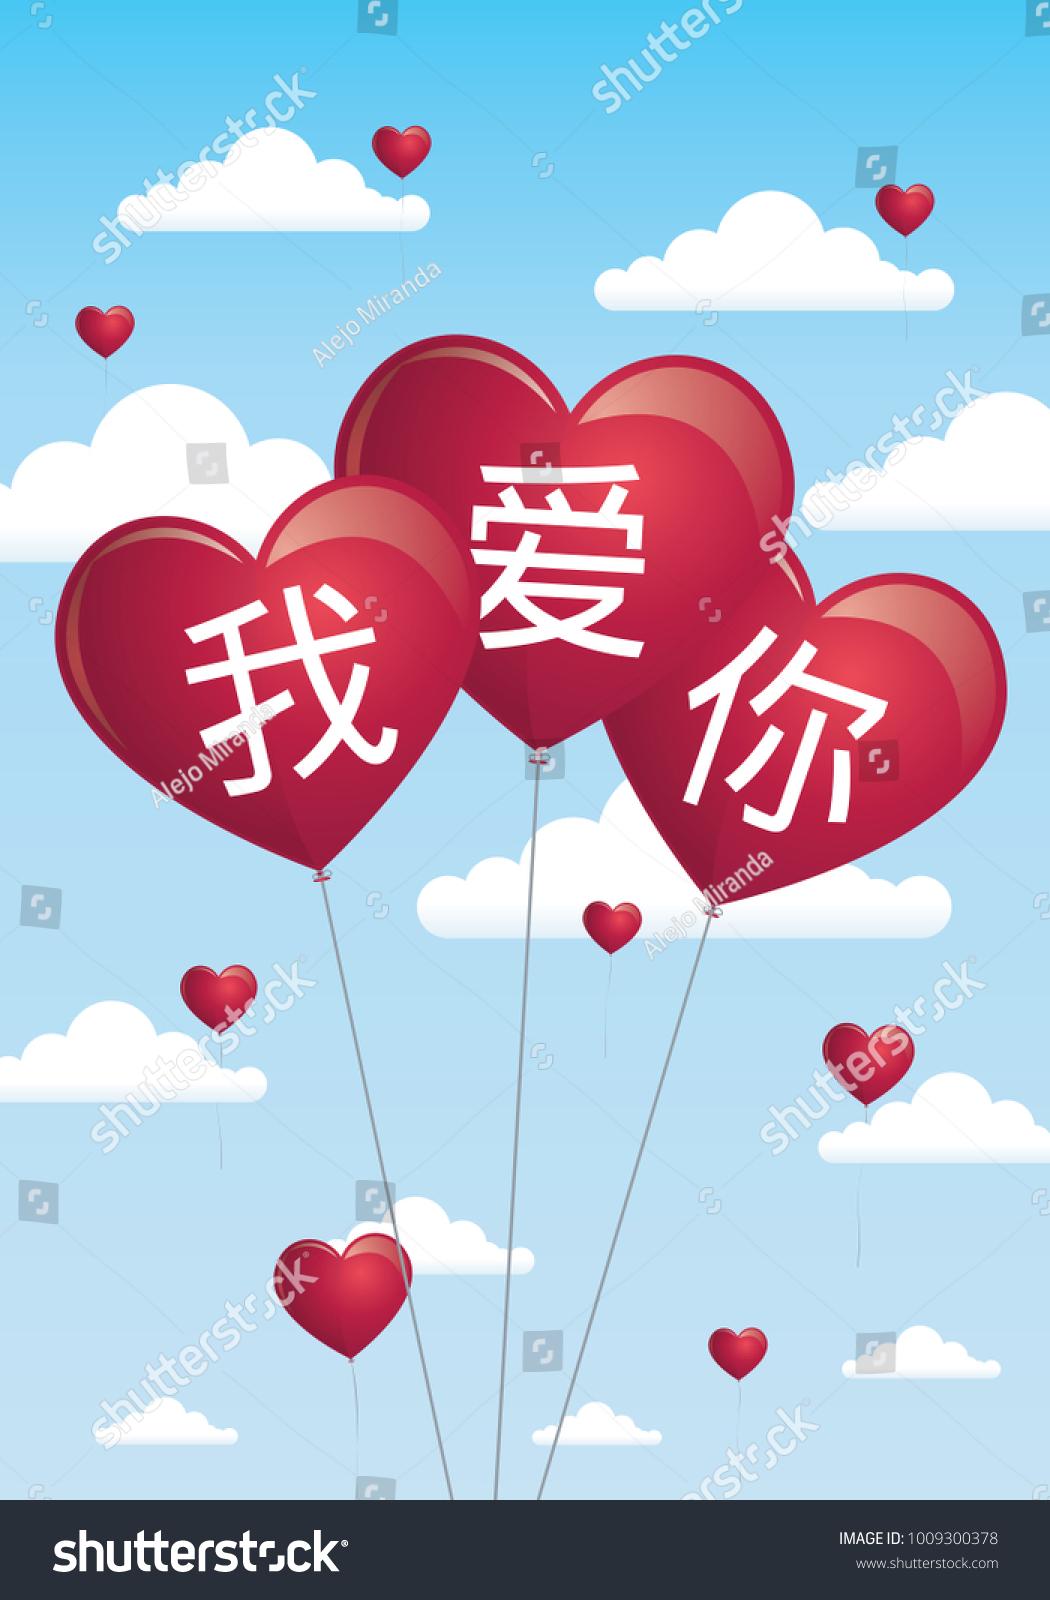 Love in mandarin chinese symbols gallery symbol and sign ideas phrase love you mandarin chinese language stock vector 1009300378 phrase i love you in mandarin chinese buycottarizona Choice Image